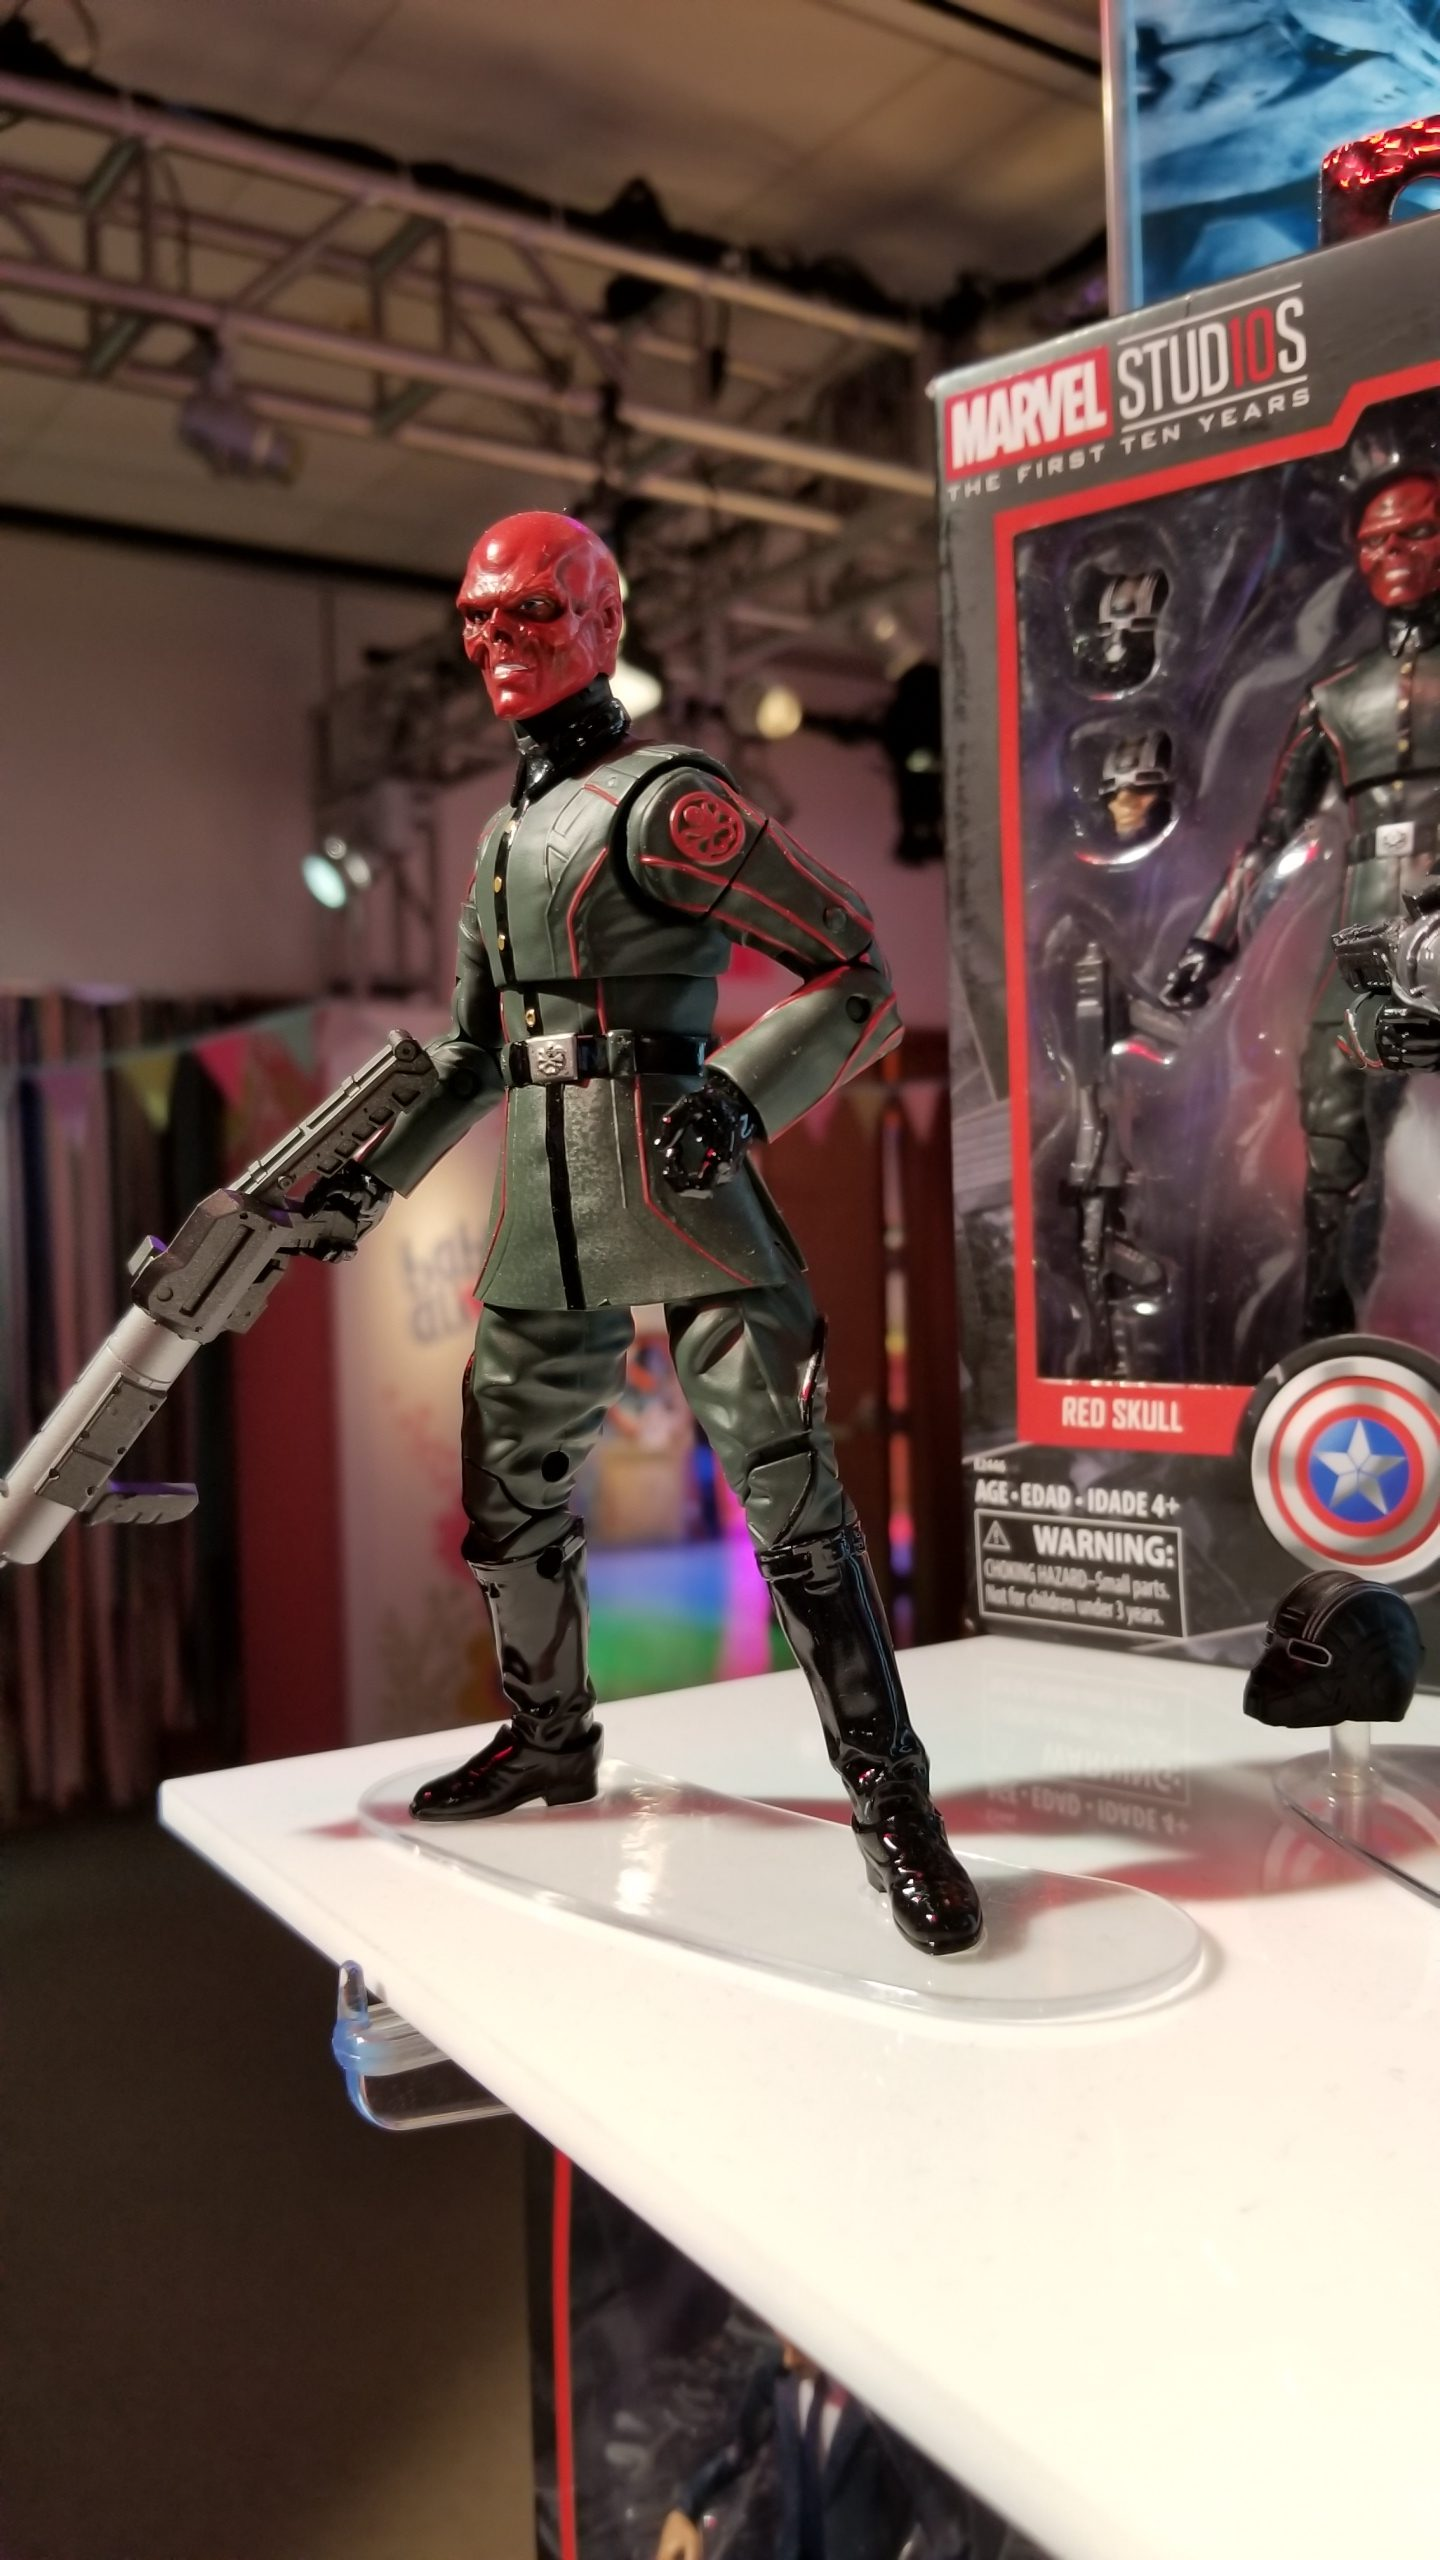 Red Skull Marvel Studios First 10 Years Legends Captain America Series